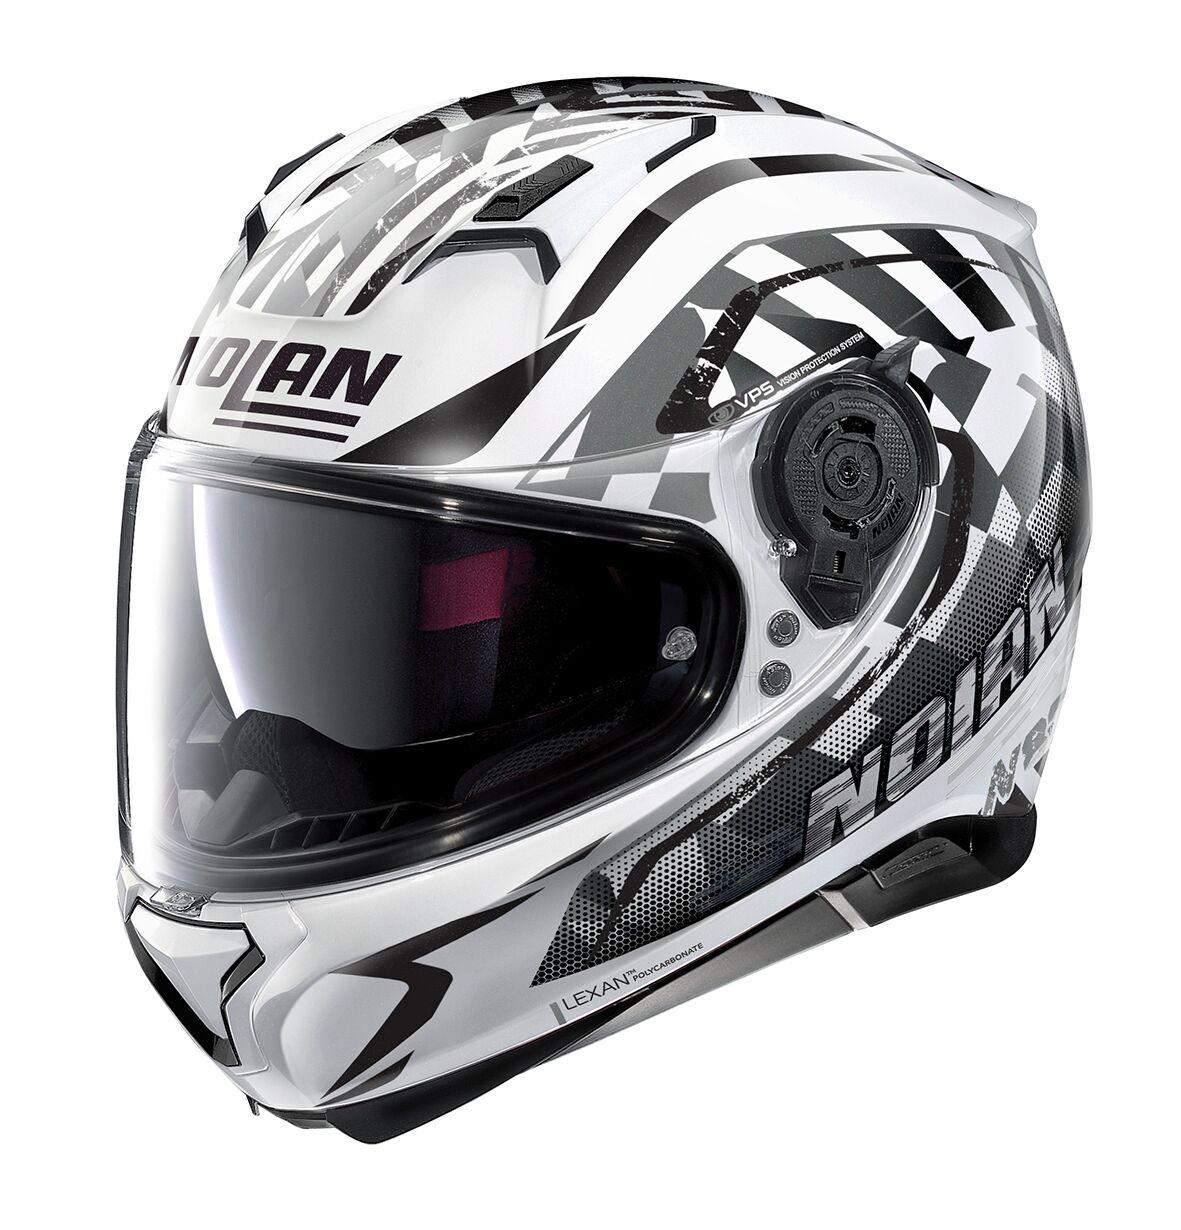 Moto helma Nolan N87 Venator N-Com Metal White 93